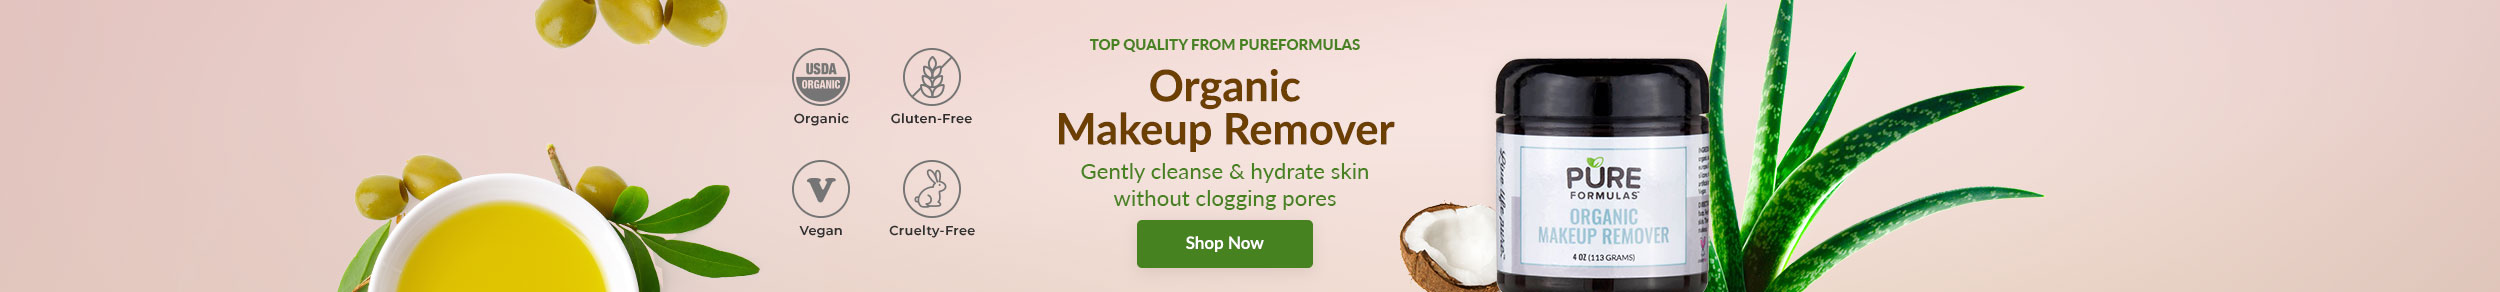 https://i3.pureformulas.net/images/static/Pureformulas-Organic-Makeup-Remover_slide2_061318.jpg